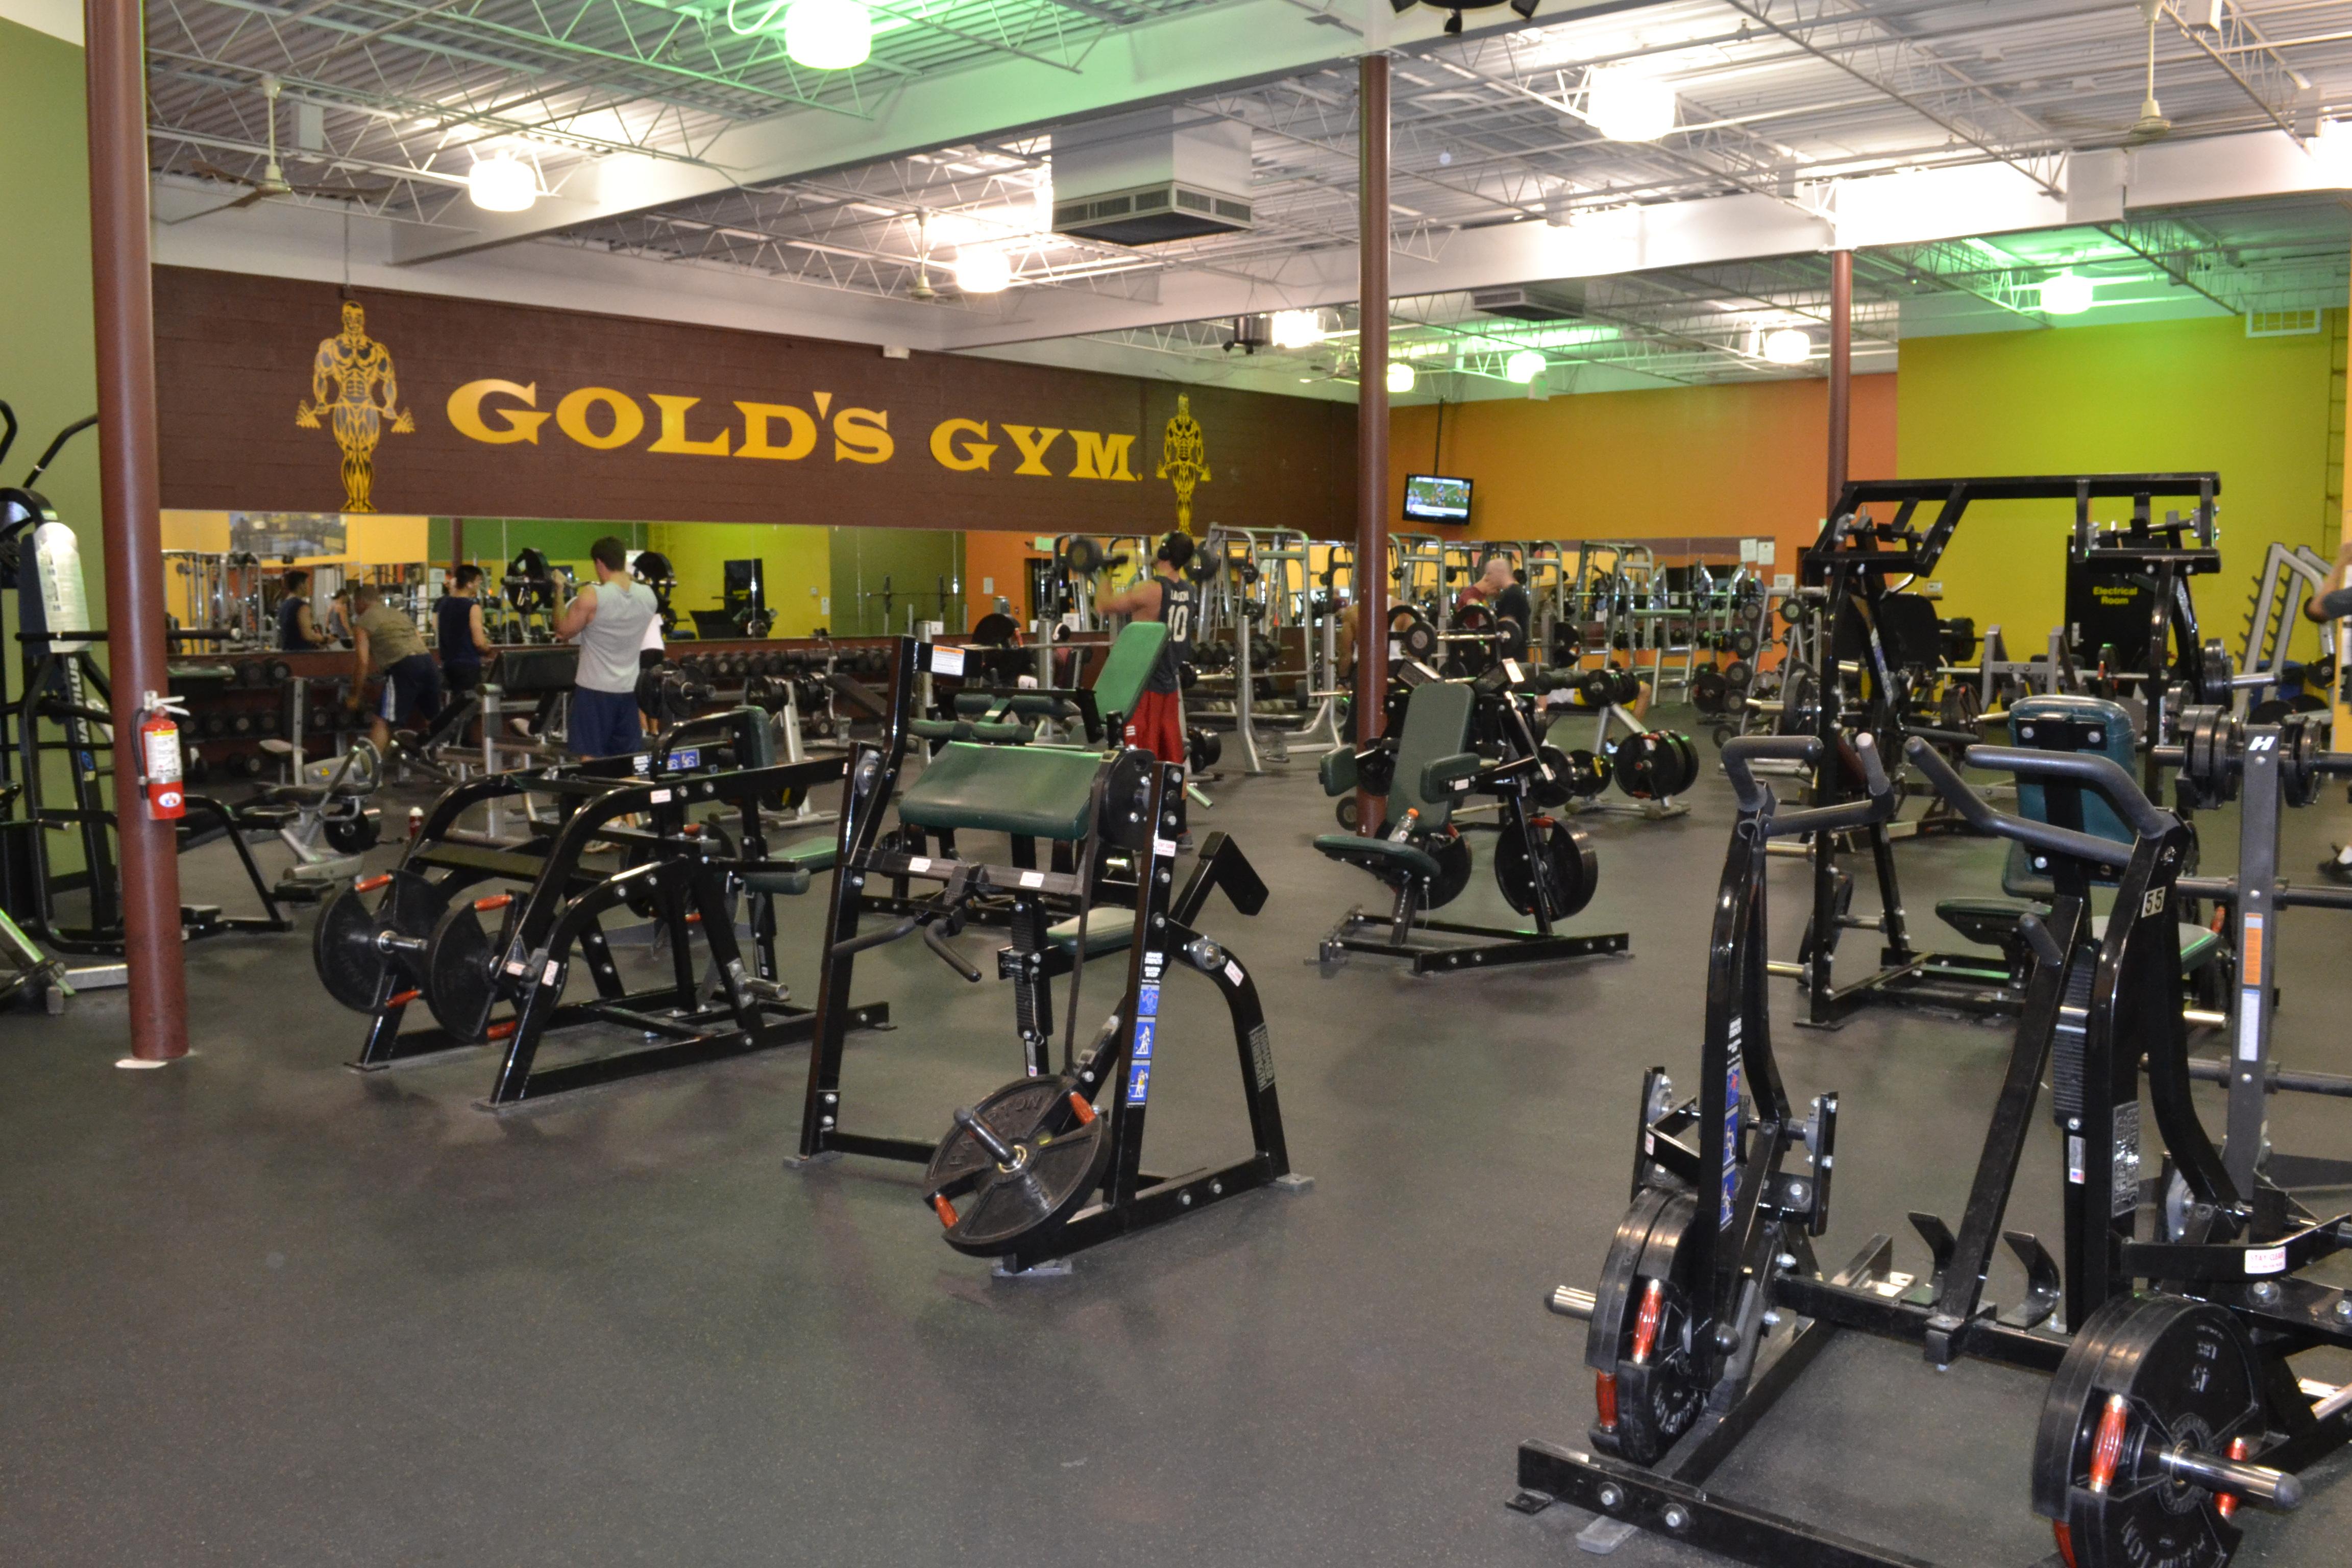 stay profita golds gym - HD4608×3072